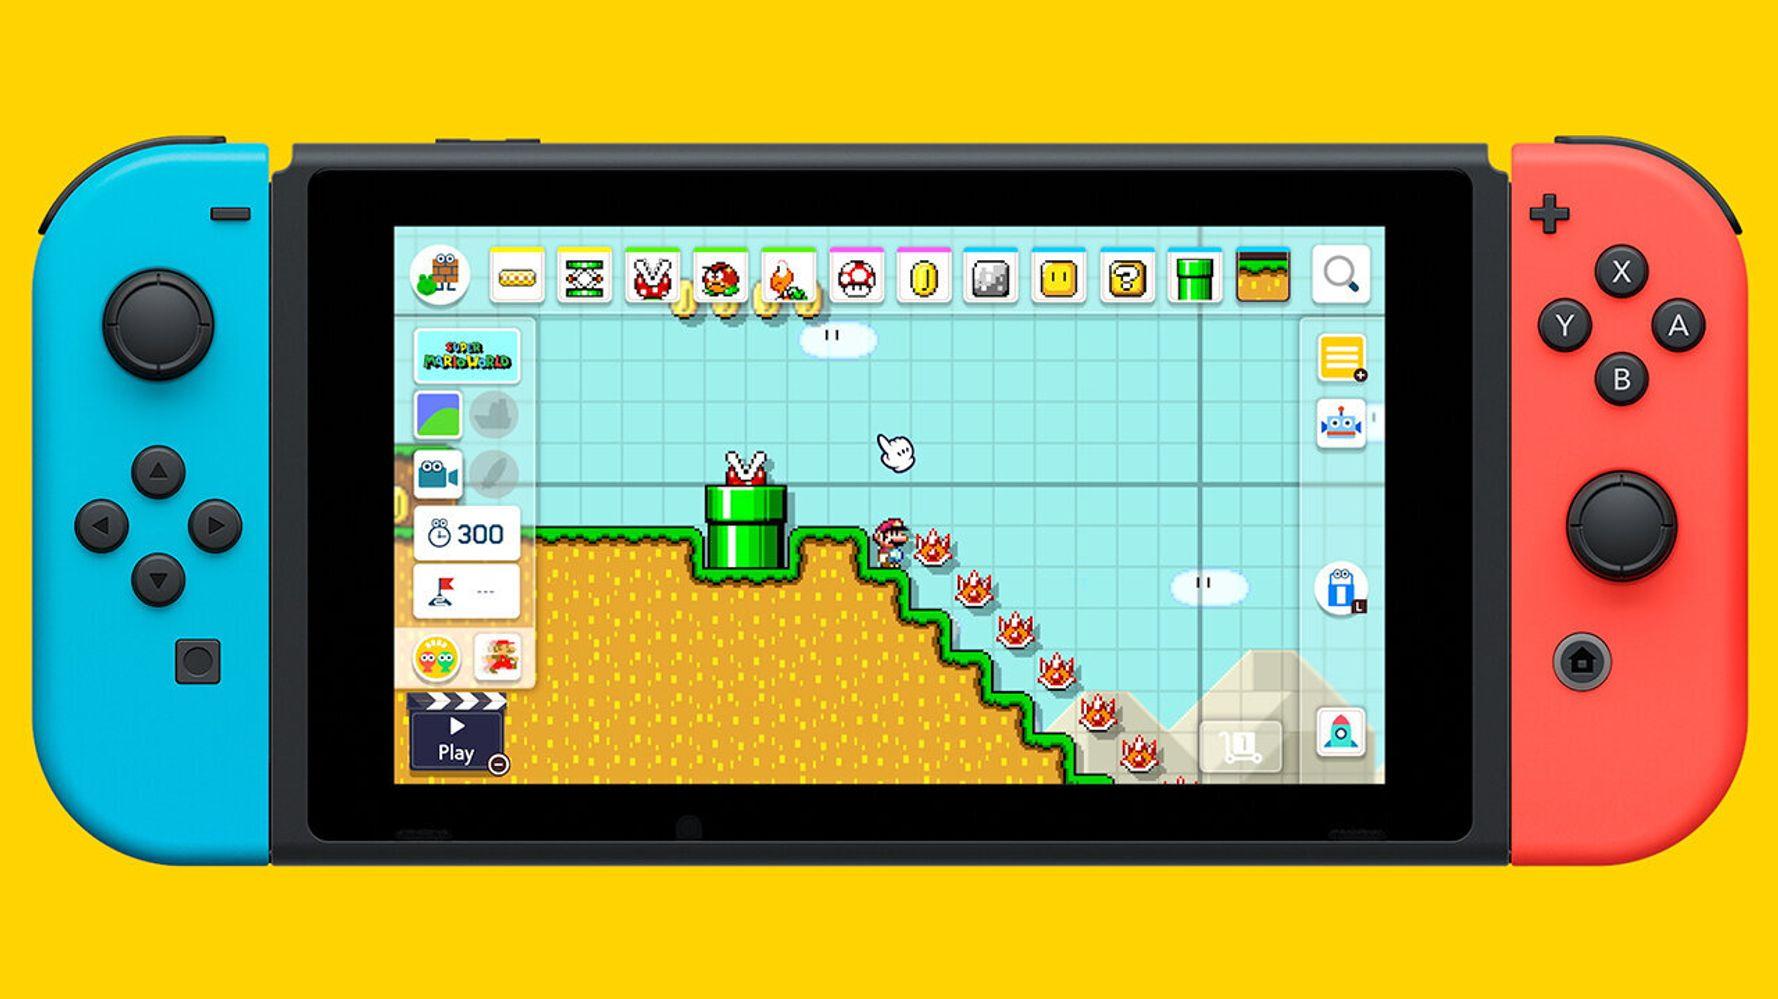 Super Mario Maker 2 Update 2 Release Date Revealed, Adds Master Sword,  Ninji Speedruns, And More   HuffPost India Entertainment